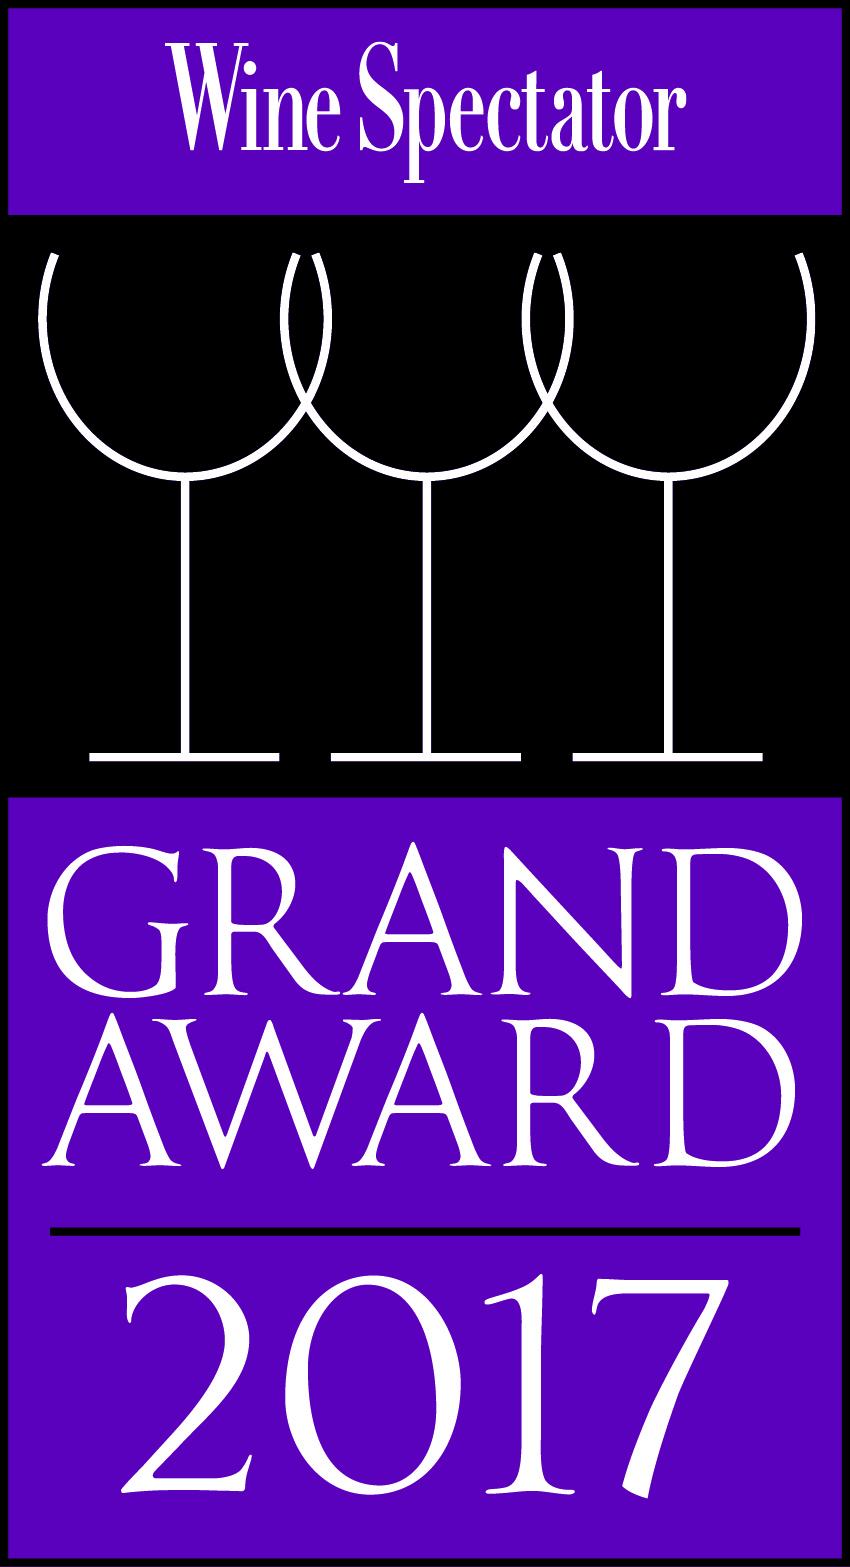 Wine Spectator Grand Award 2017